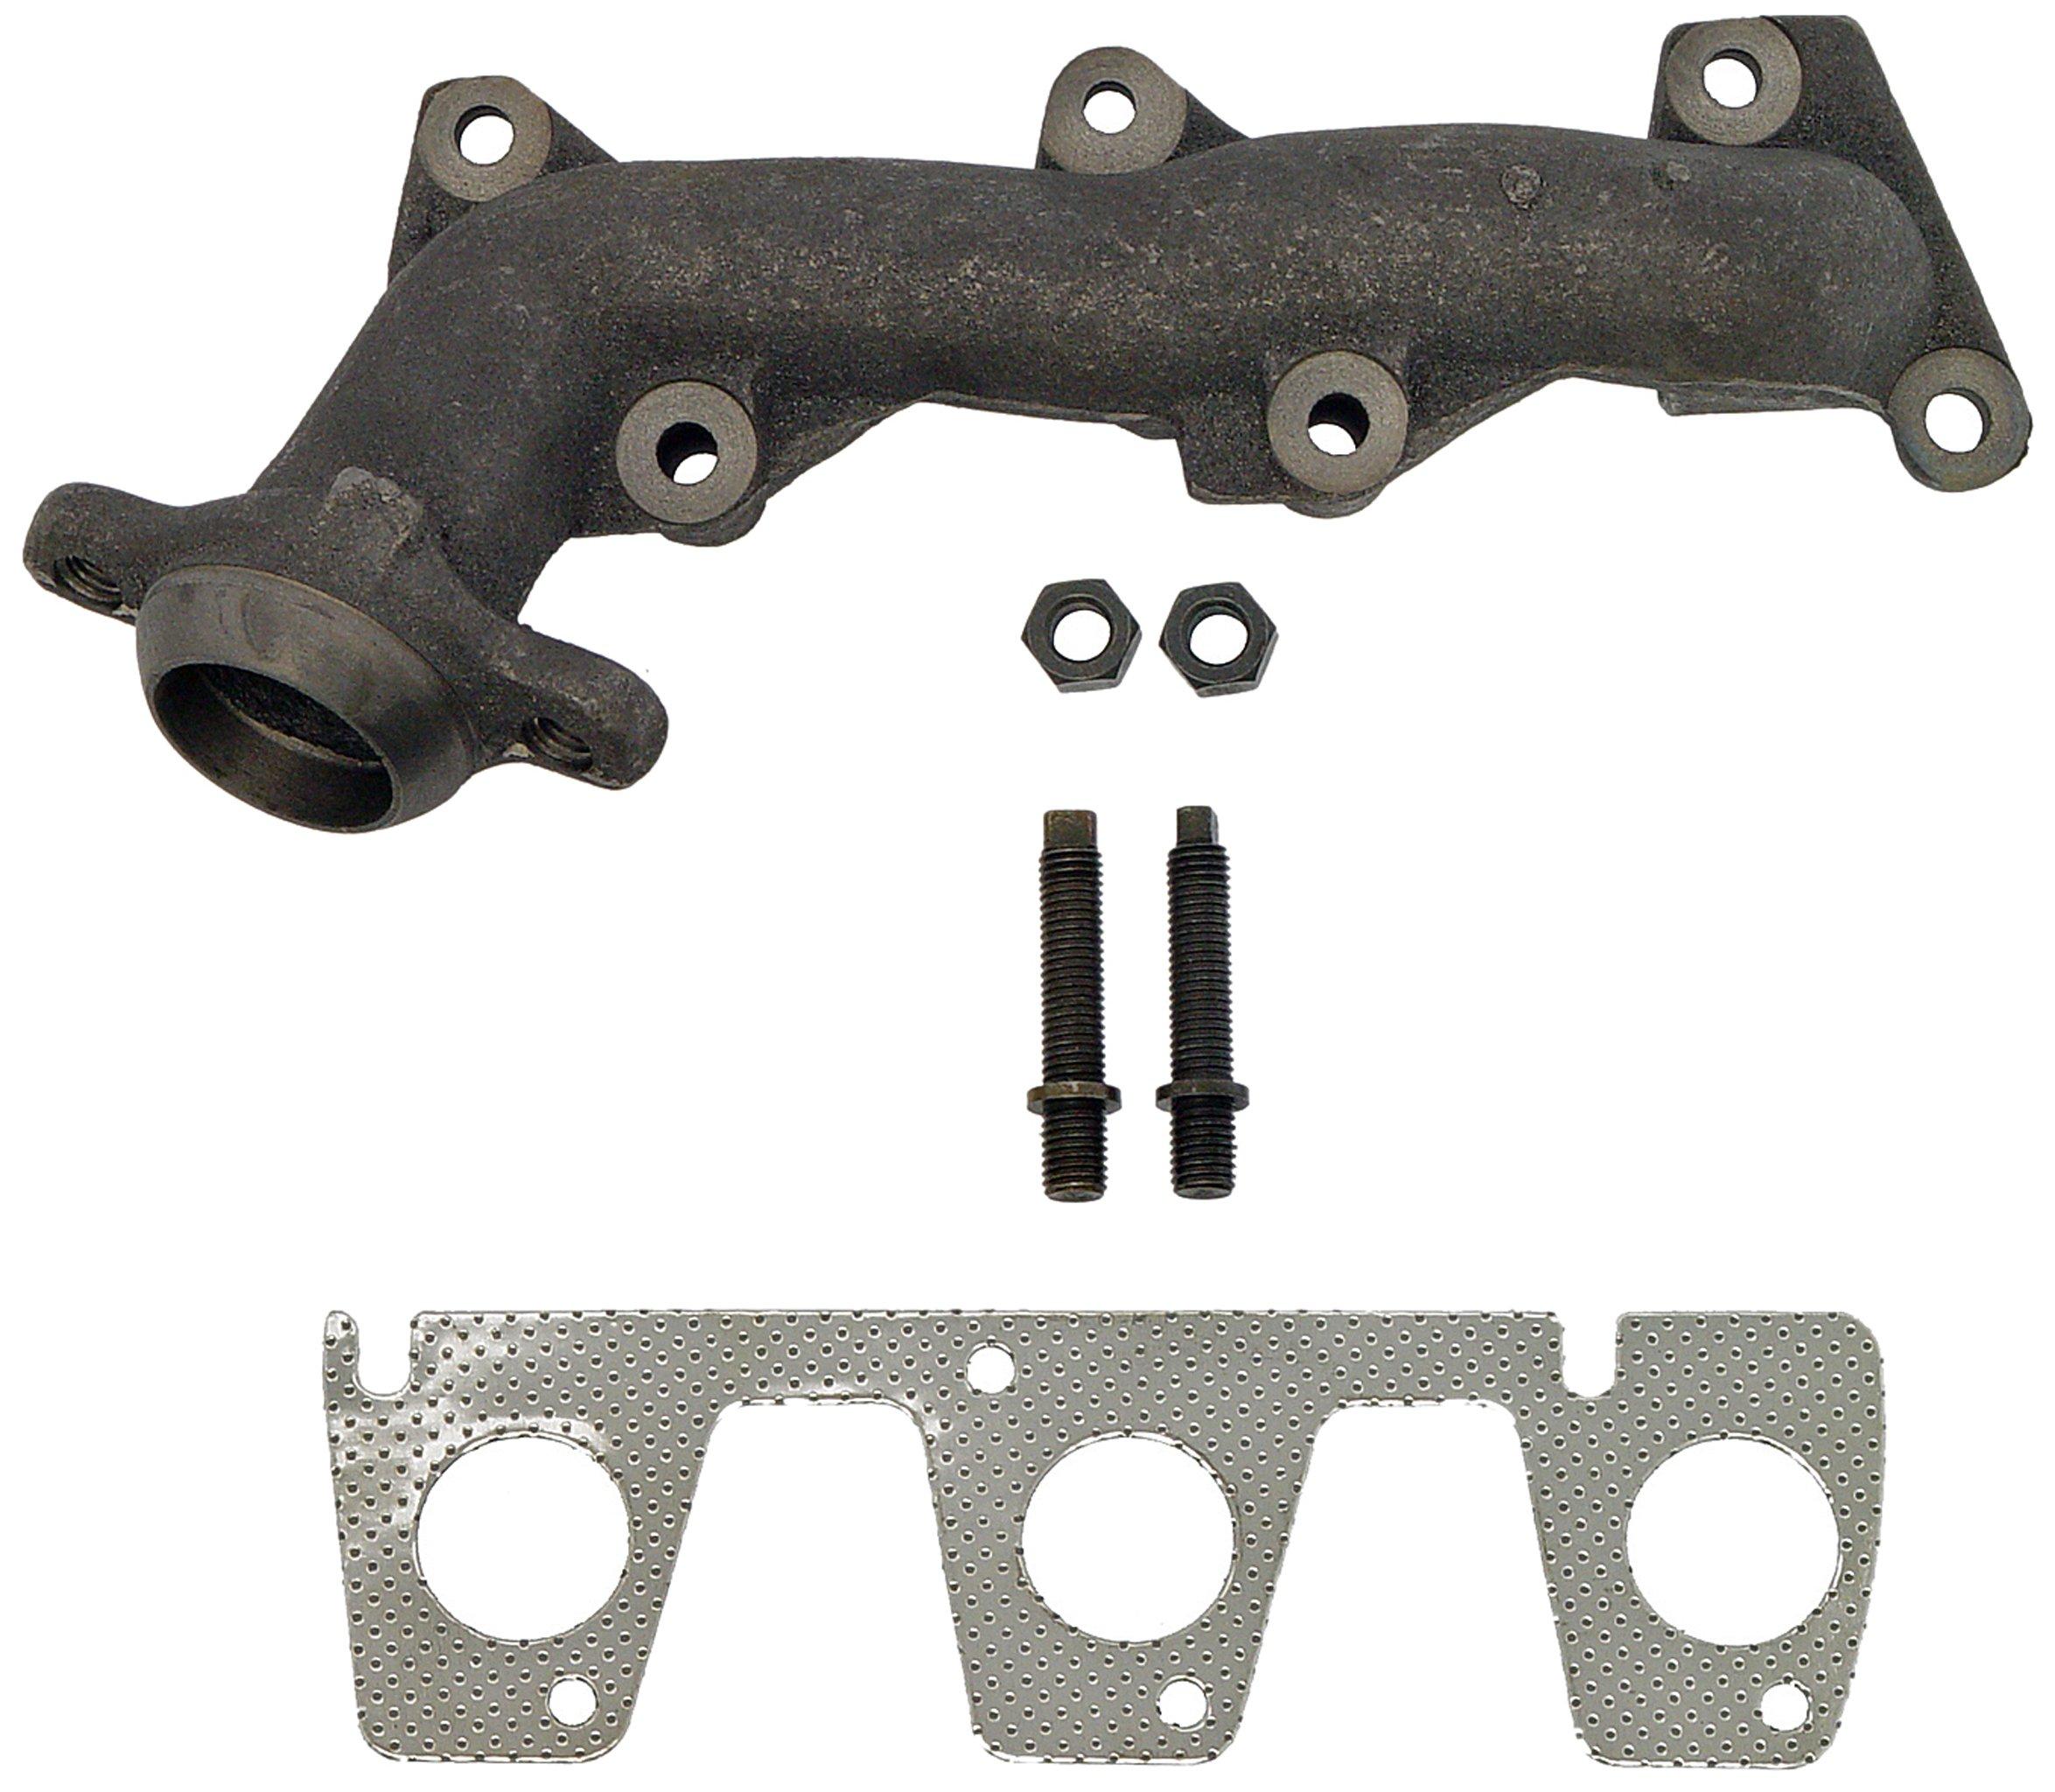 Dorman 674-410 Exhaust Manifold Kit by Dorman